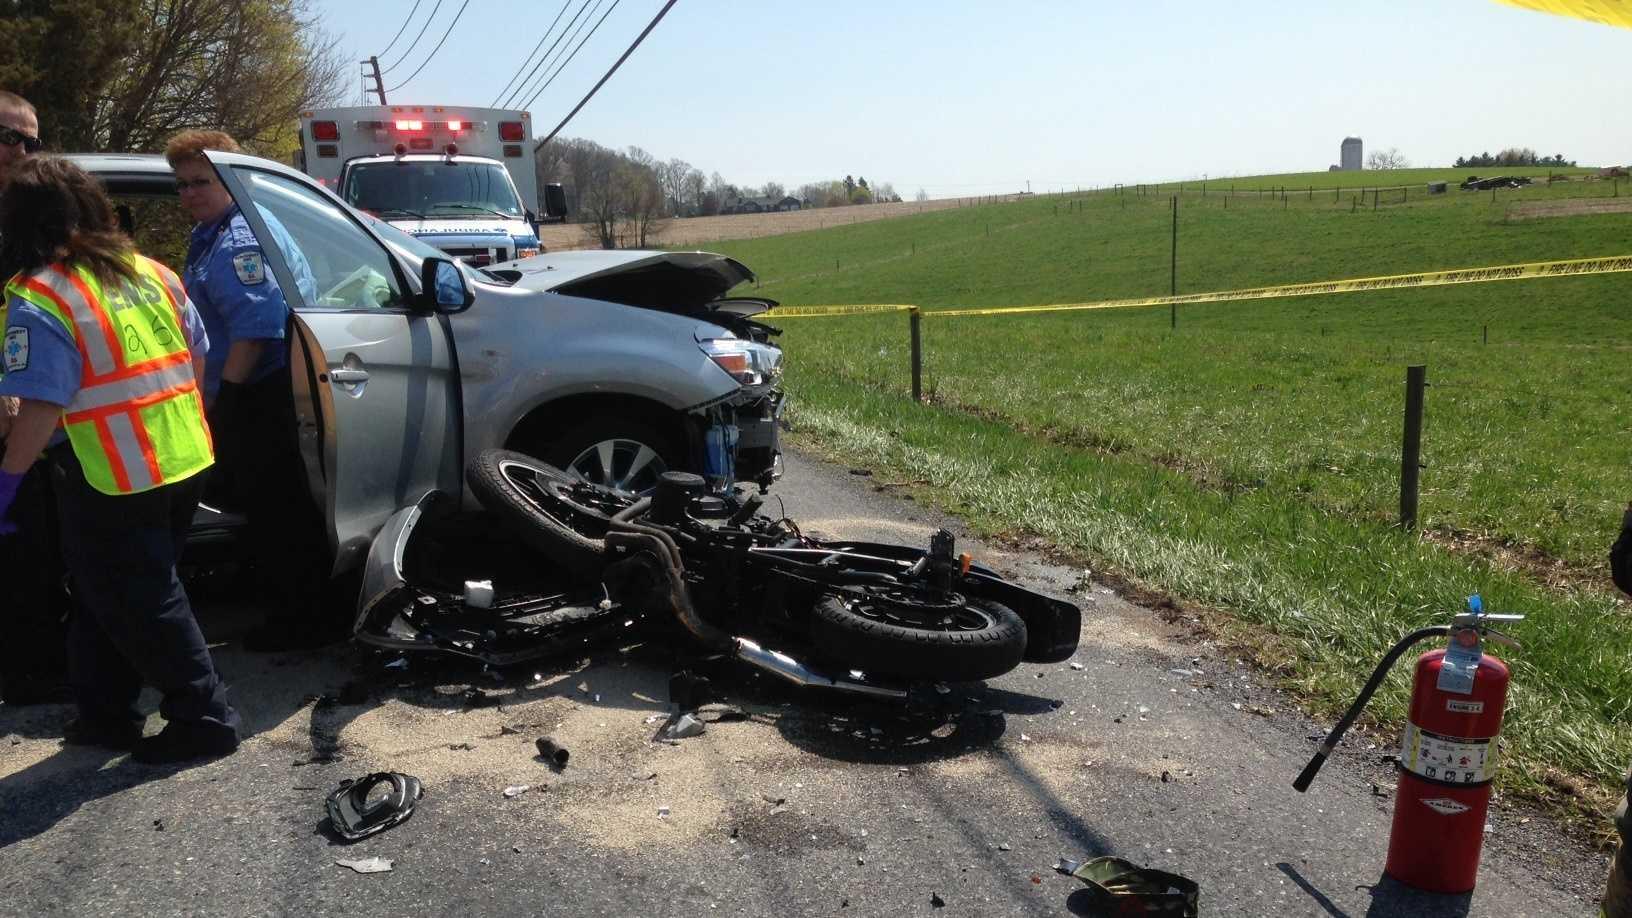 4.26.14 Penn Township Crash